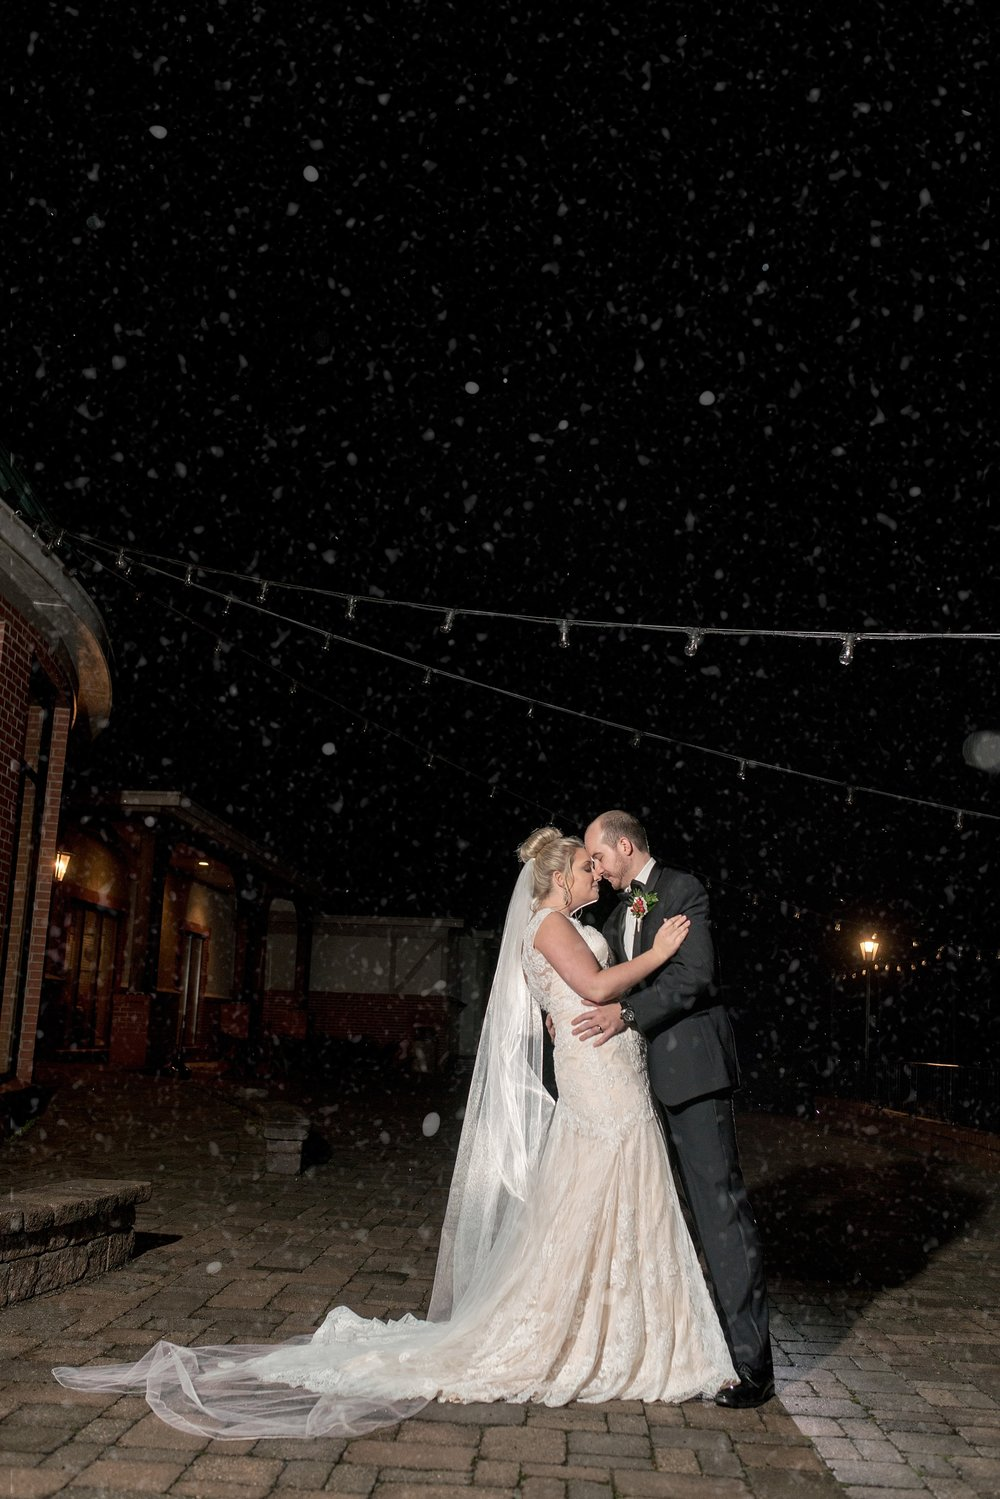 Benvenue-Country-CLub-WeddingPhotogrpaher-134.jpg